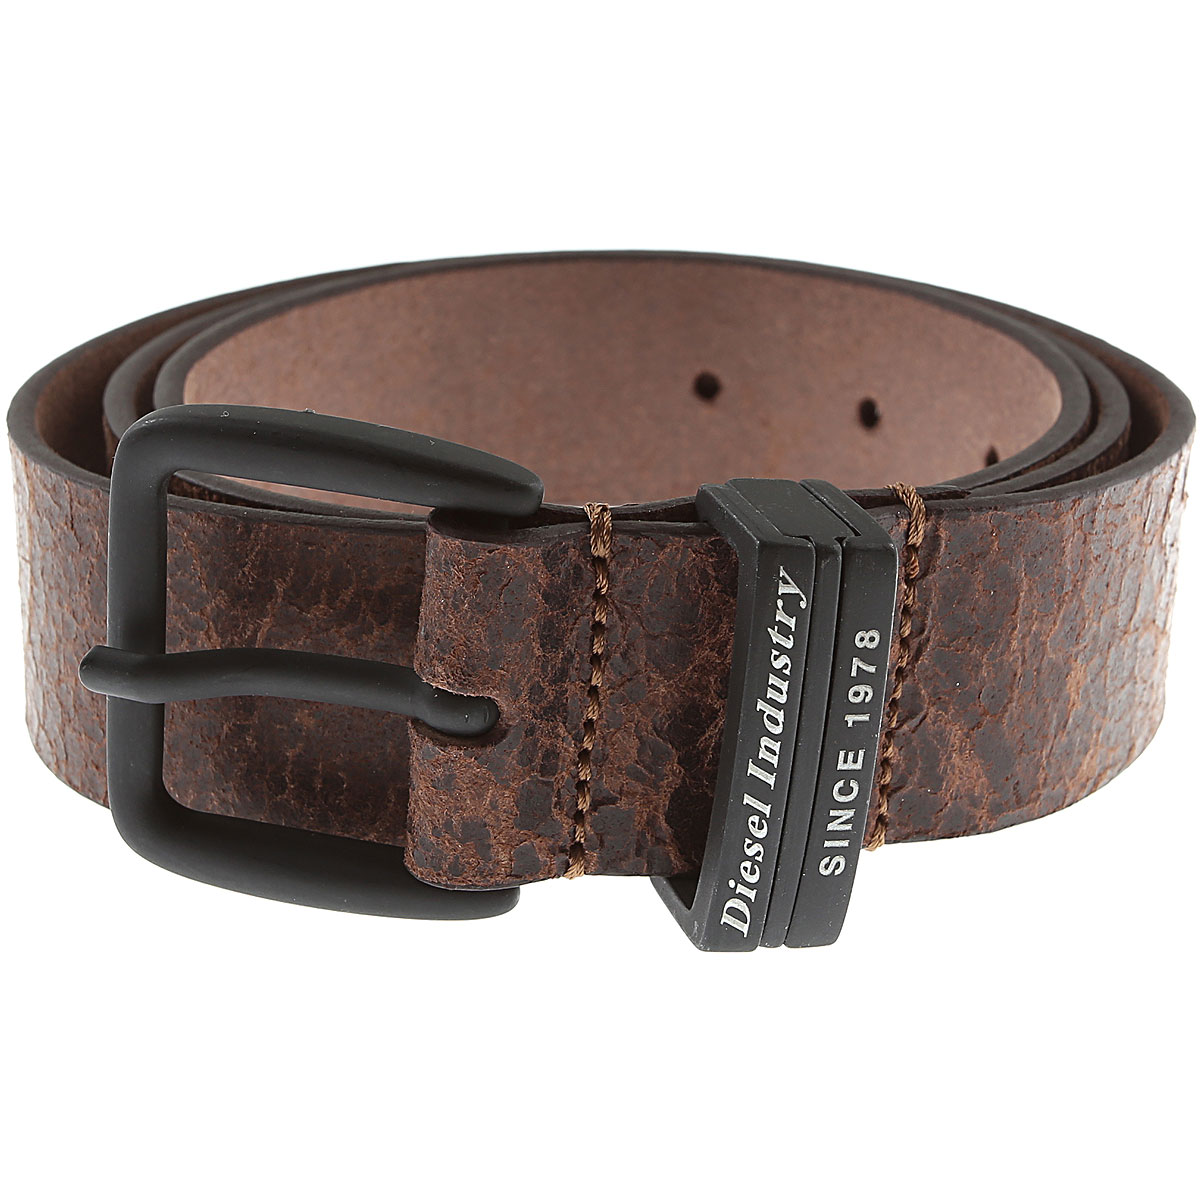 Diesel Belts, Dark Brown, Leather, 2019, 85 90 95